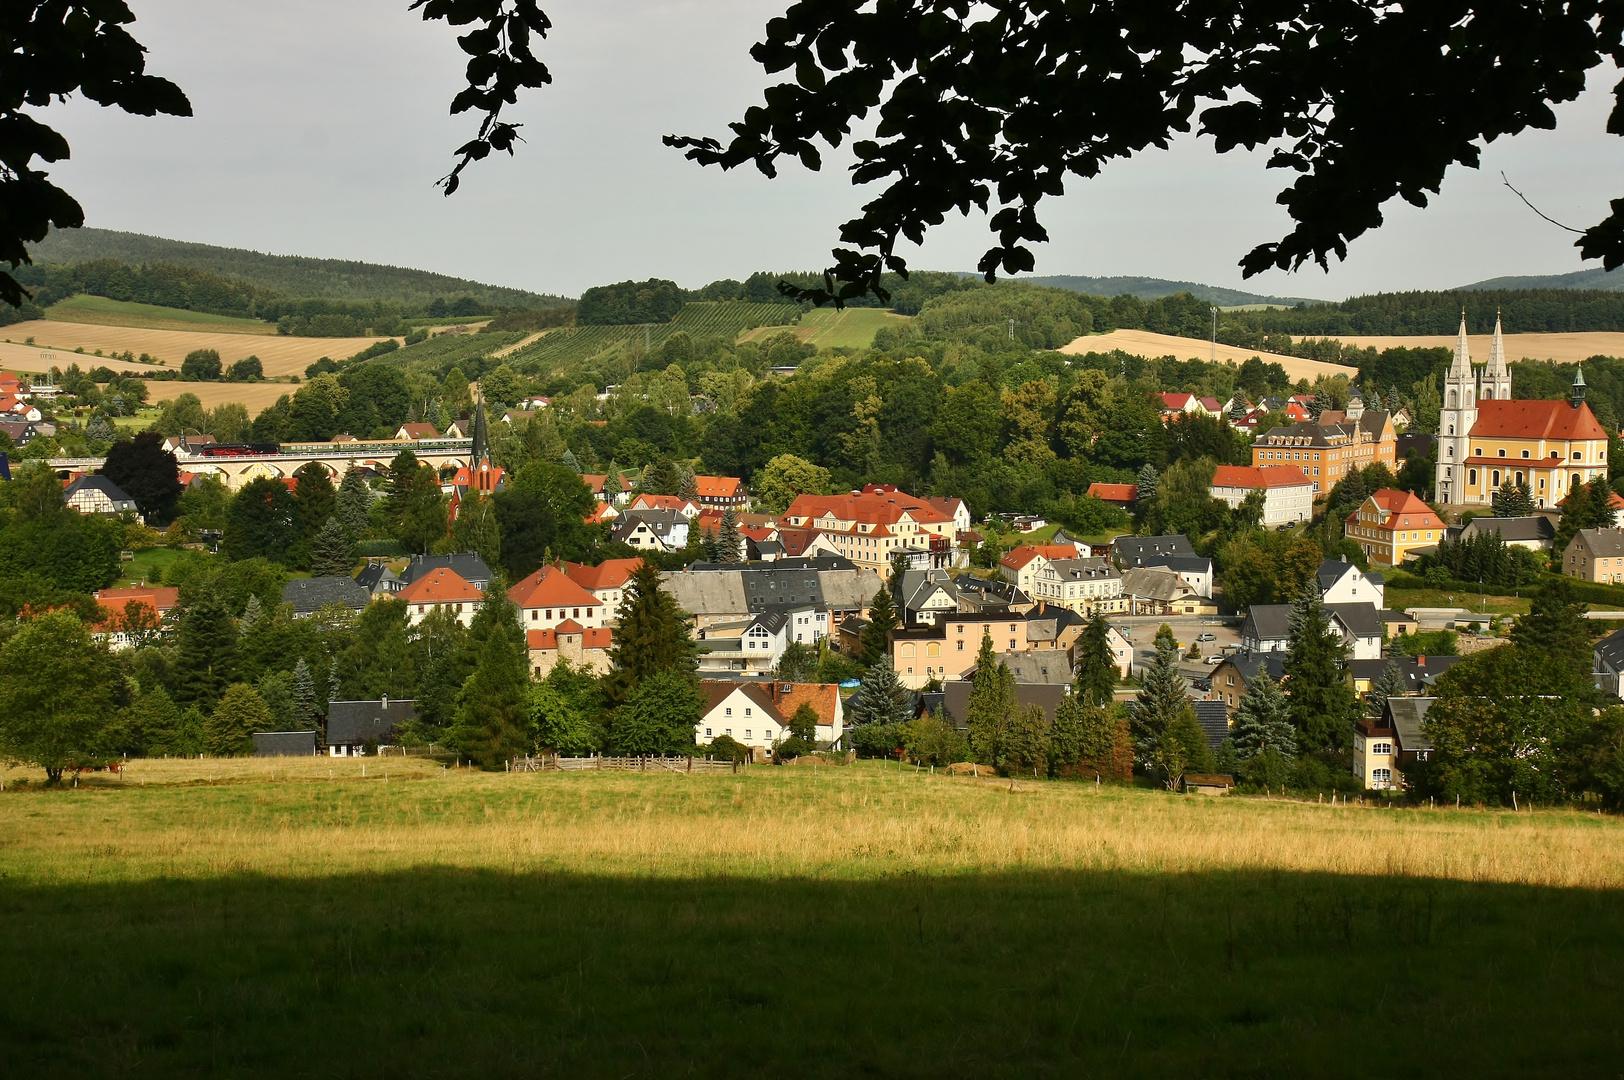 Schirgiswalde-Kirschau